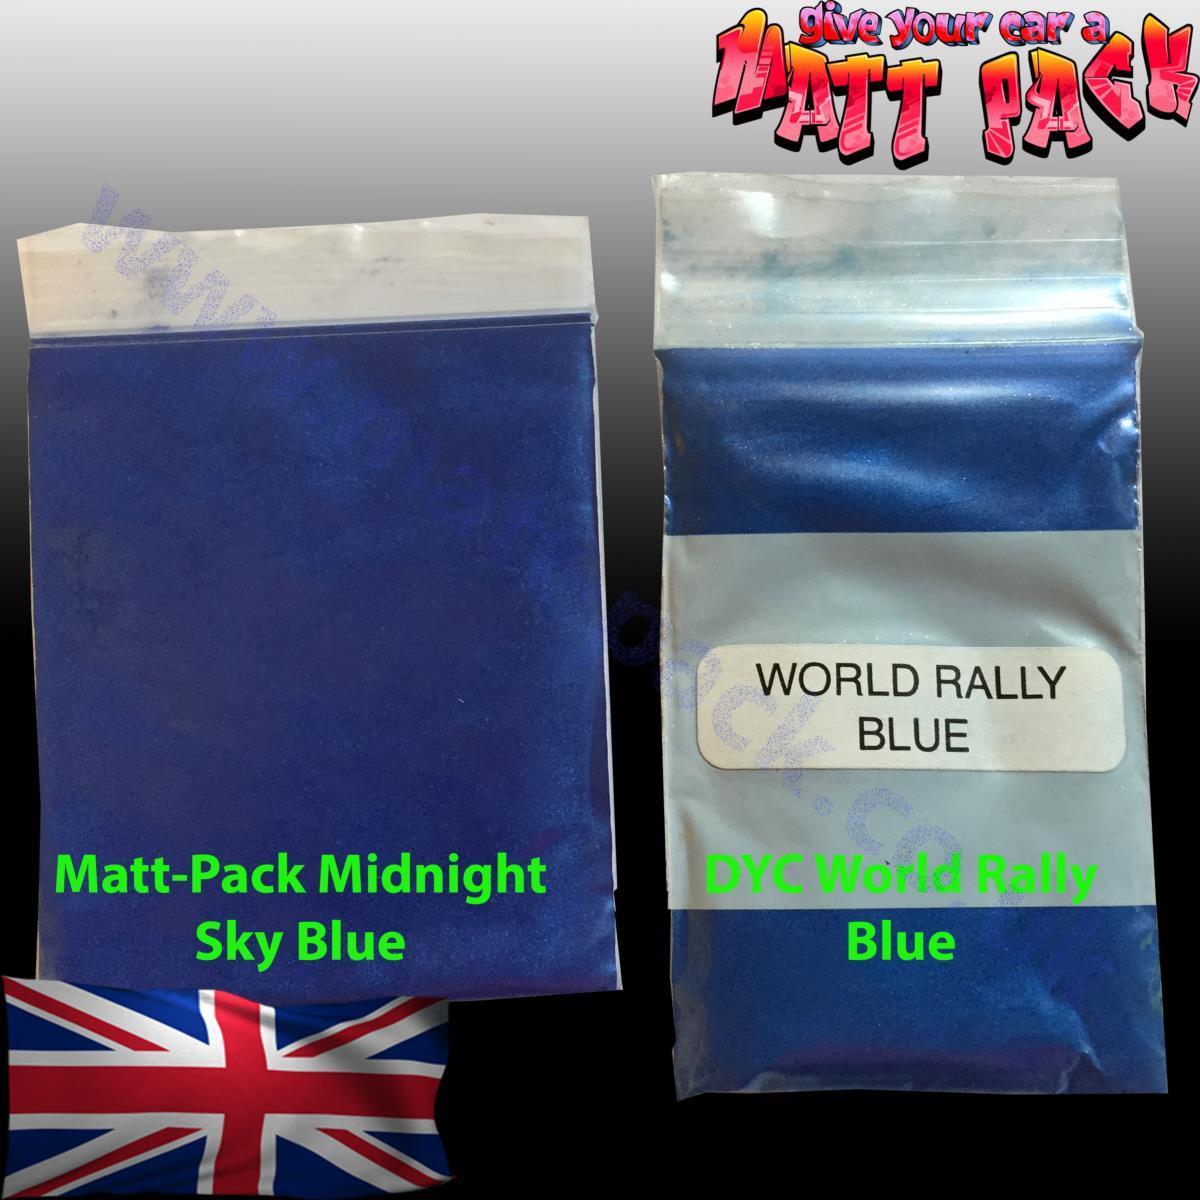 Midnight Sky Blue Pearl Pigment From Matt Pack